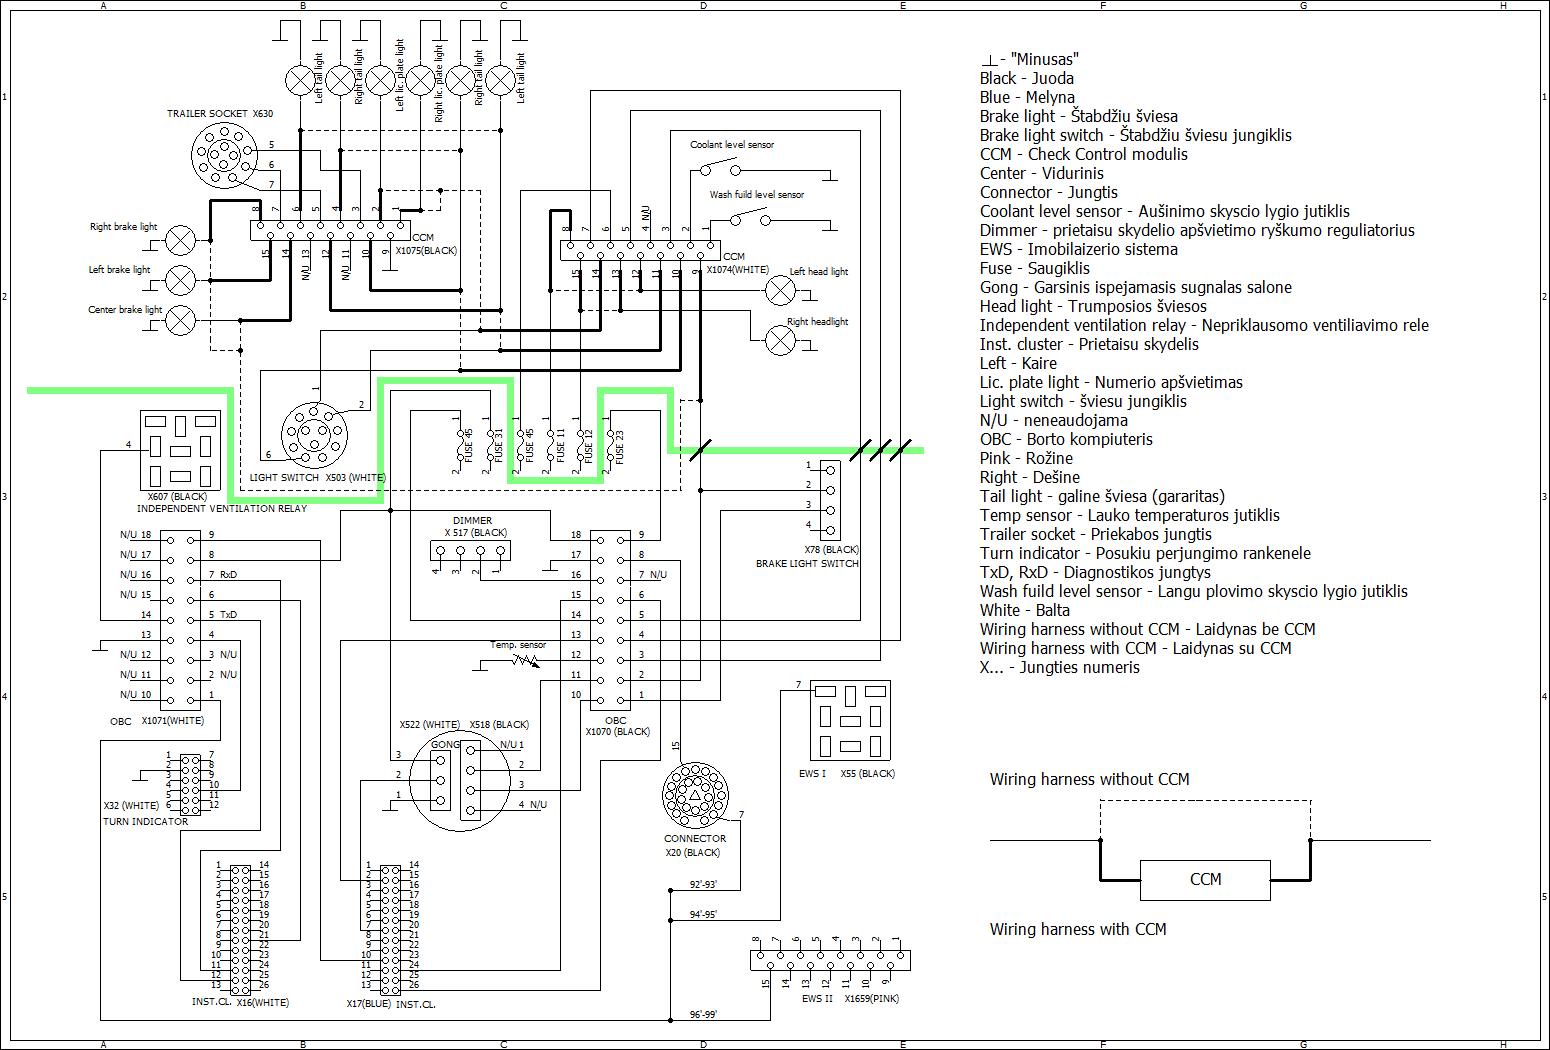 1947 Indian Chief Motorcycle Wiring Diagram Product Wiring Diagrams \u2022  FLSTF Harley-Davidson Ignition Switch Diagram Indian Chief Ignition Wiring  ...